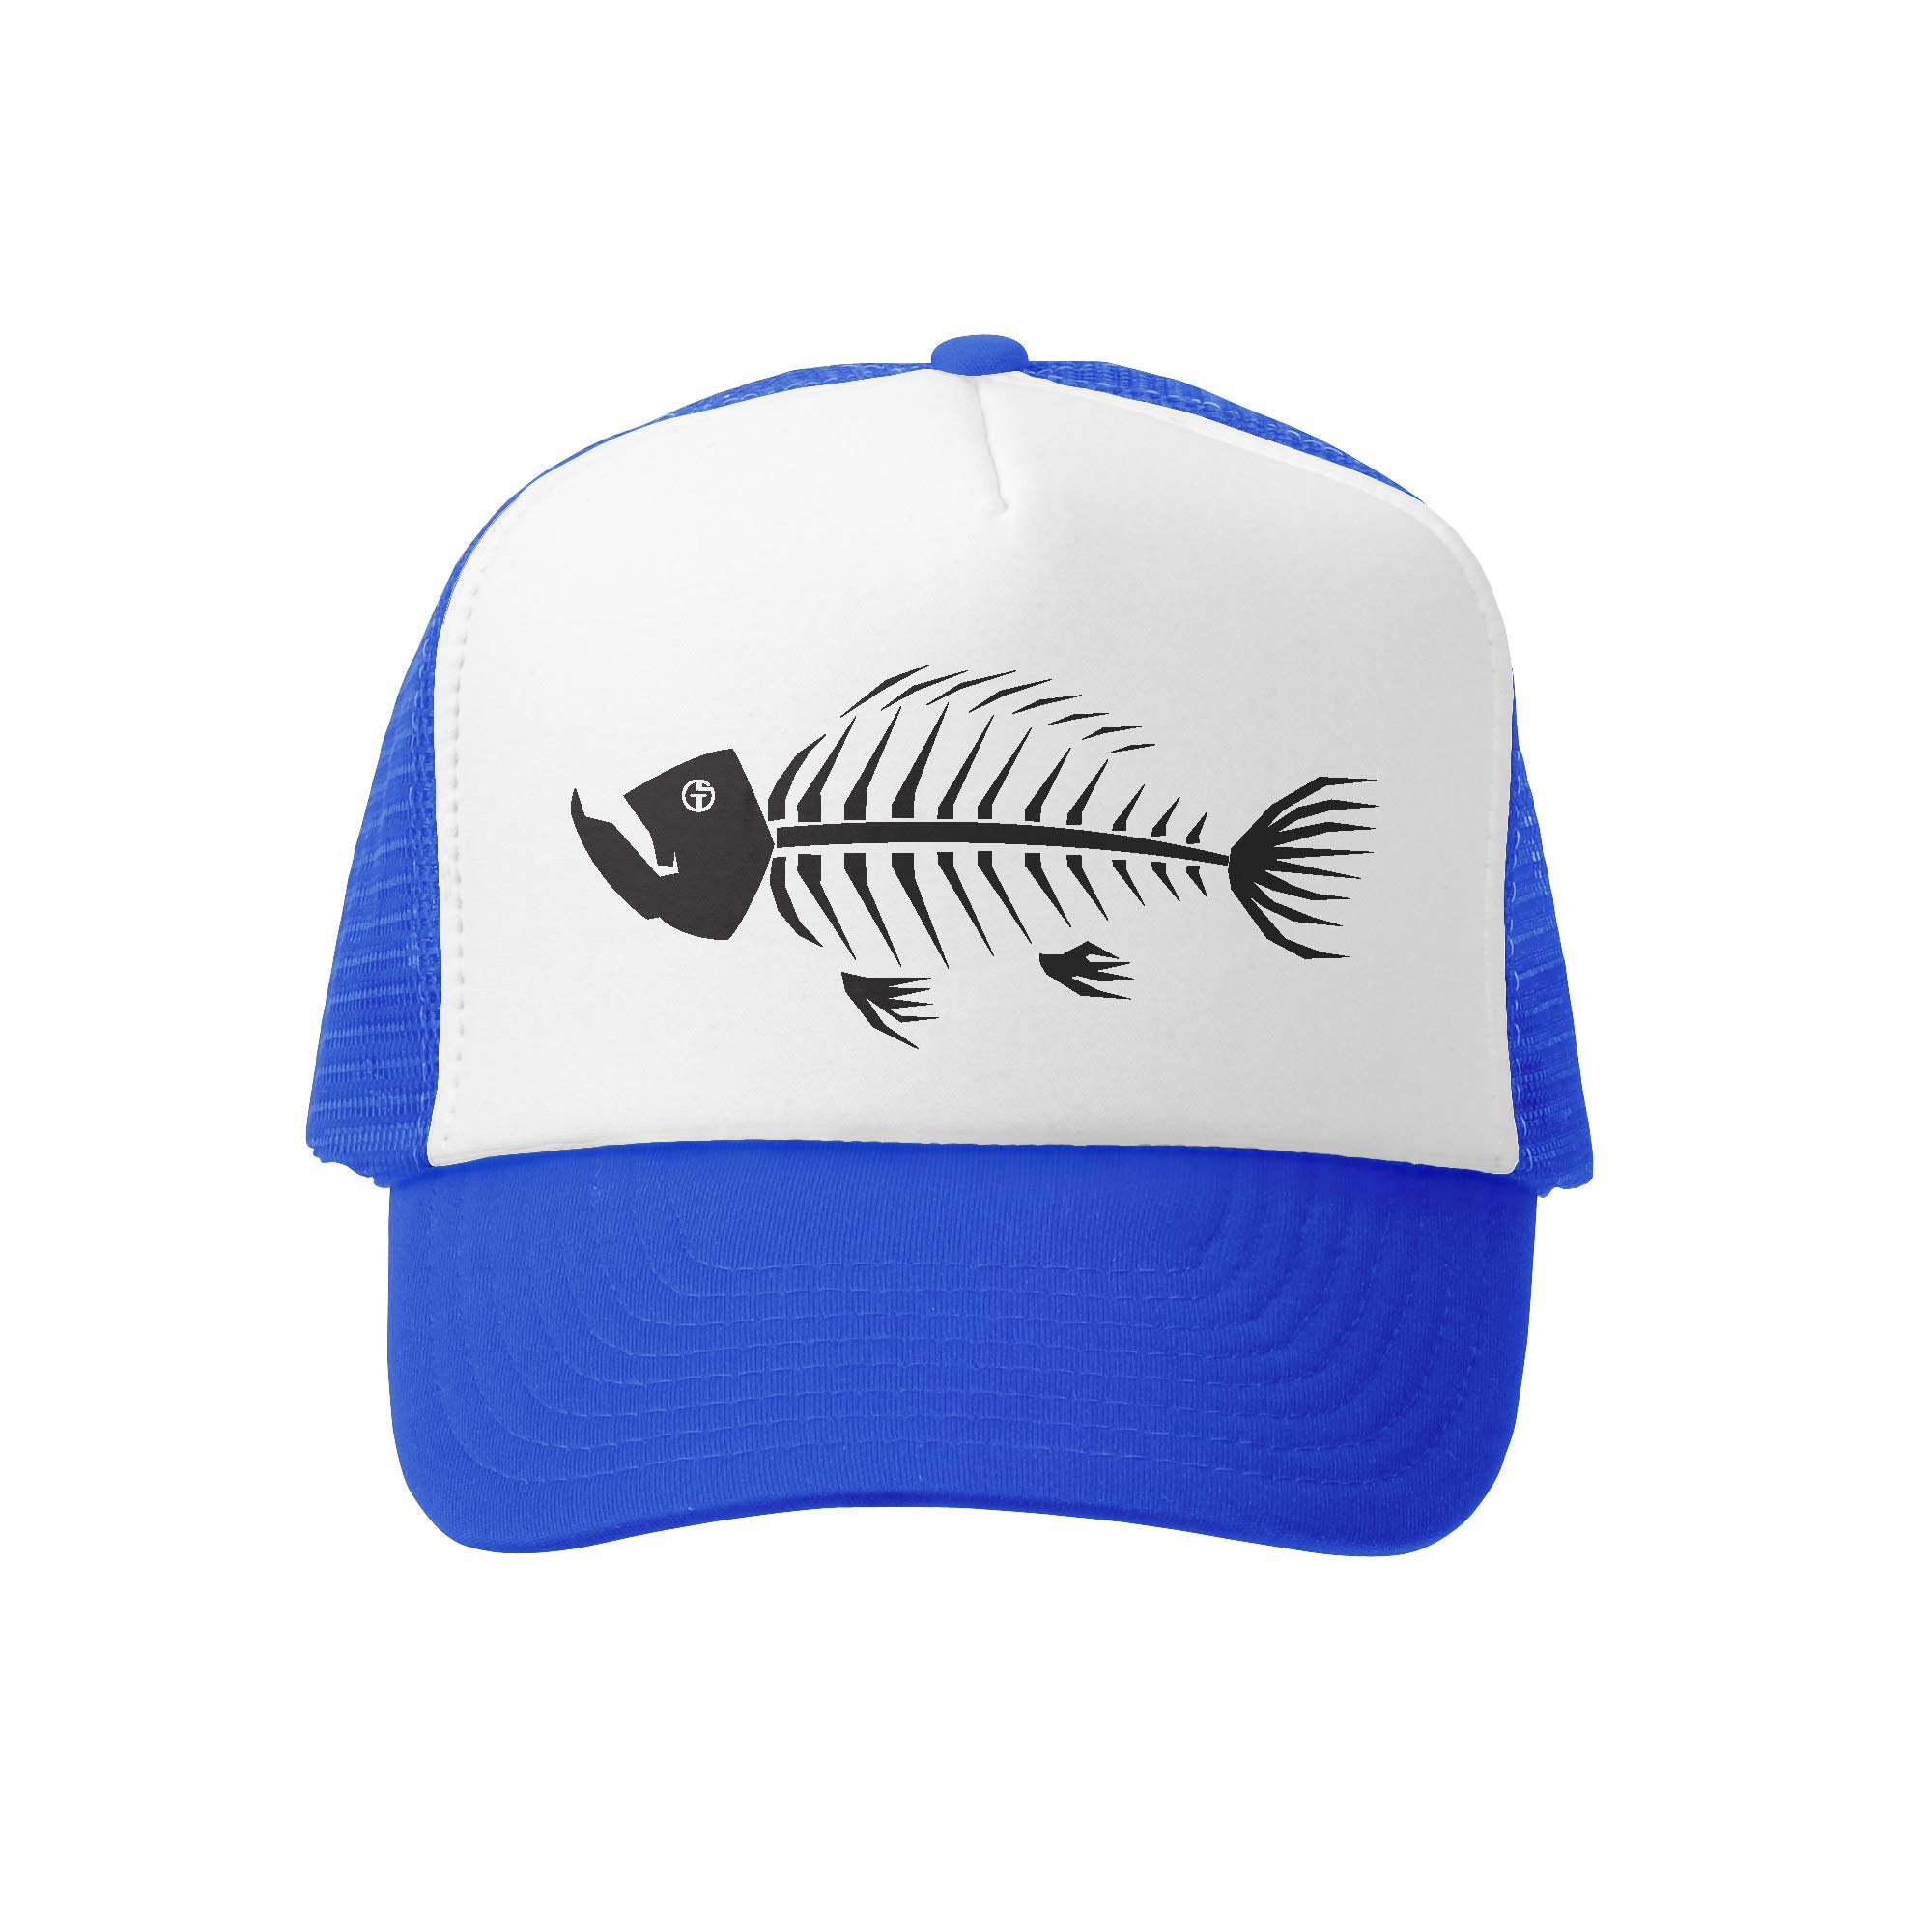 Grom Squad Kids Trucker Hat - Mesh Adjustable Baseball Cap for Boys & Girls - Baby, Infant, Toddler, School-Age Sizes (0-2yrs (Mini), Fish Bones 2.0 by Grom Squad